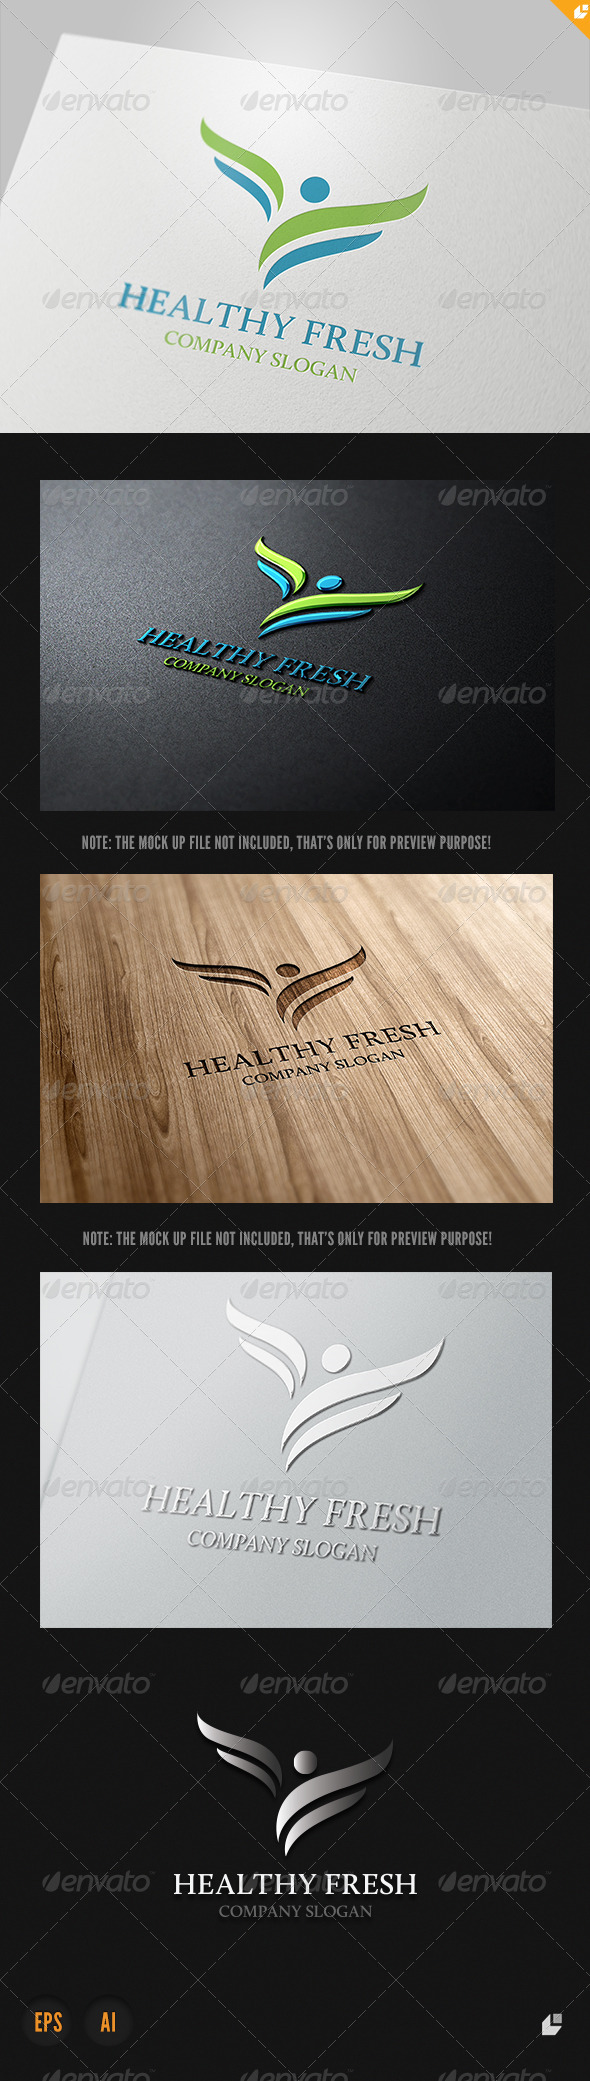 Healthy Fresh Logo - Animals Logo Templates